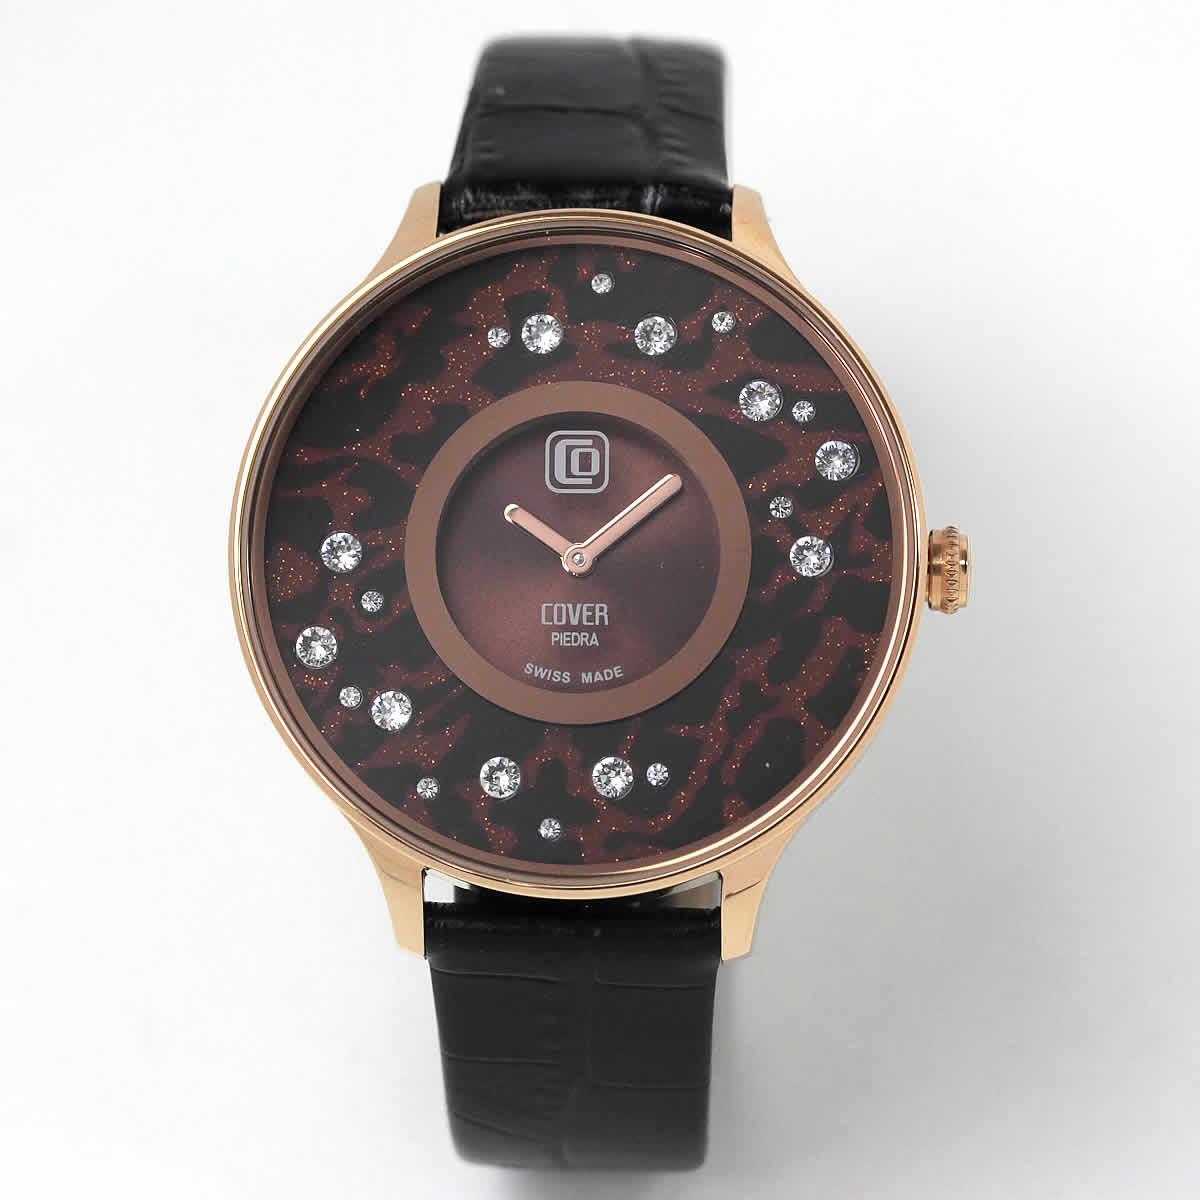 COVER(コヴァ) TREND PIEDRA STARS Co158.11 ブラウン 女性用腕時計